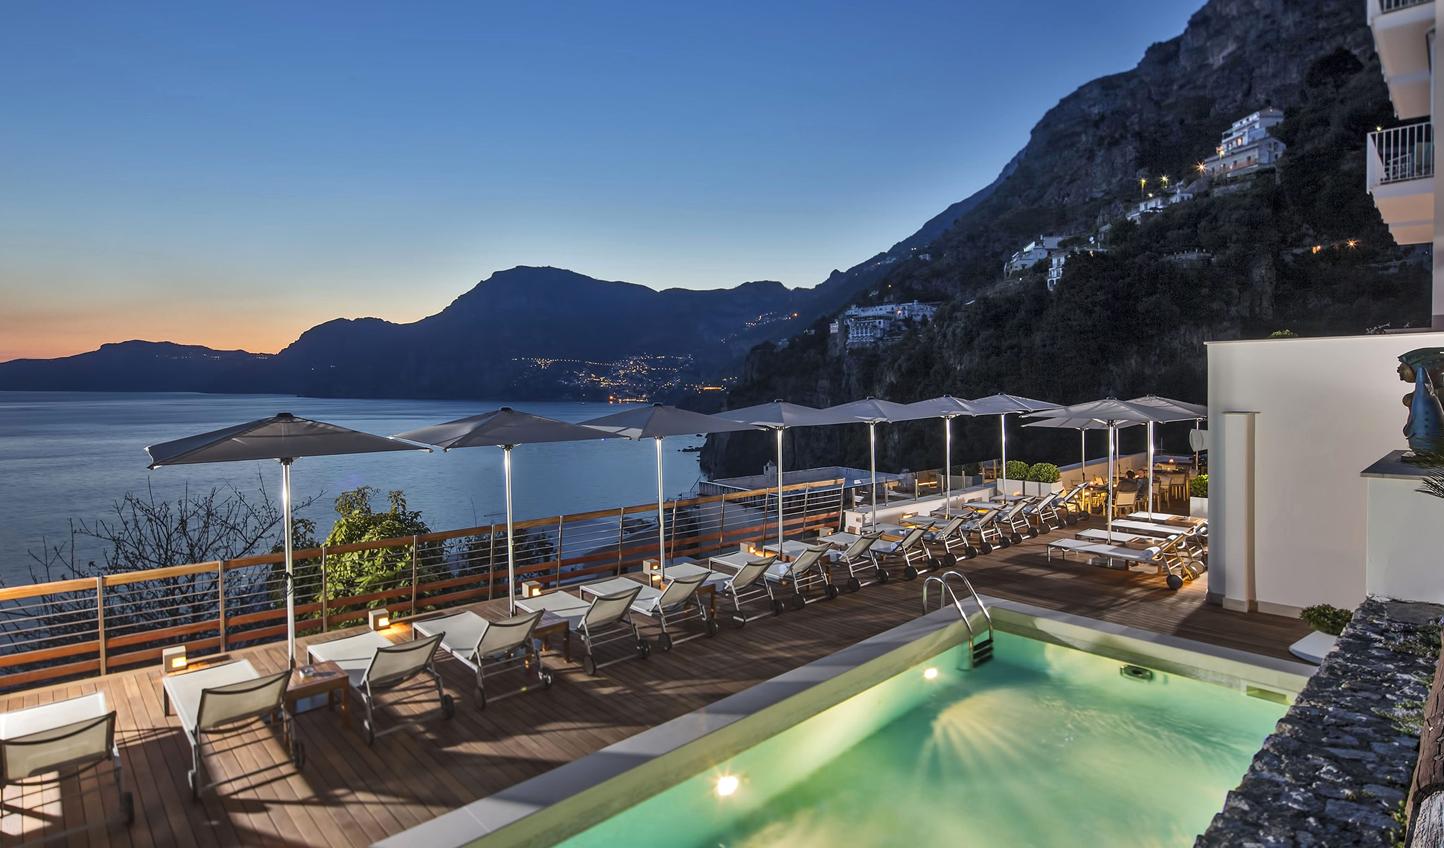 Stunning views over Amalfi